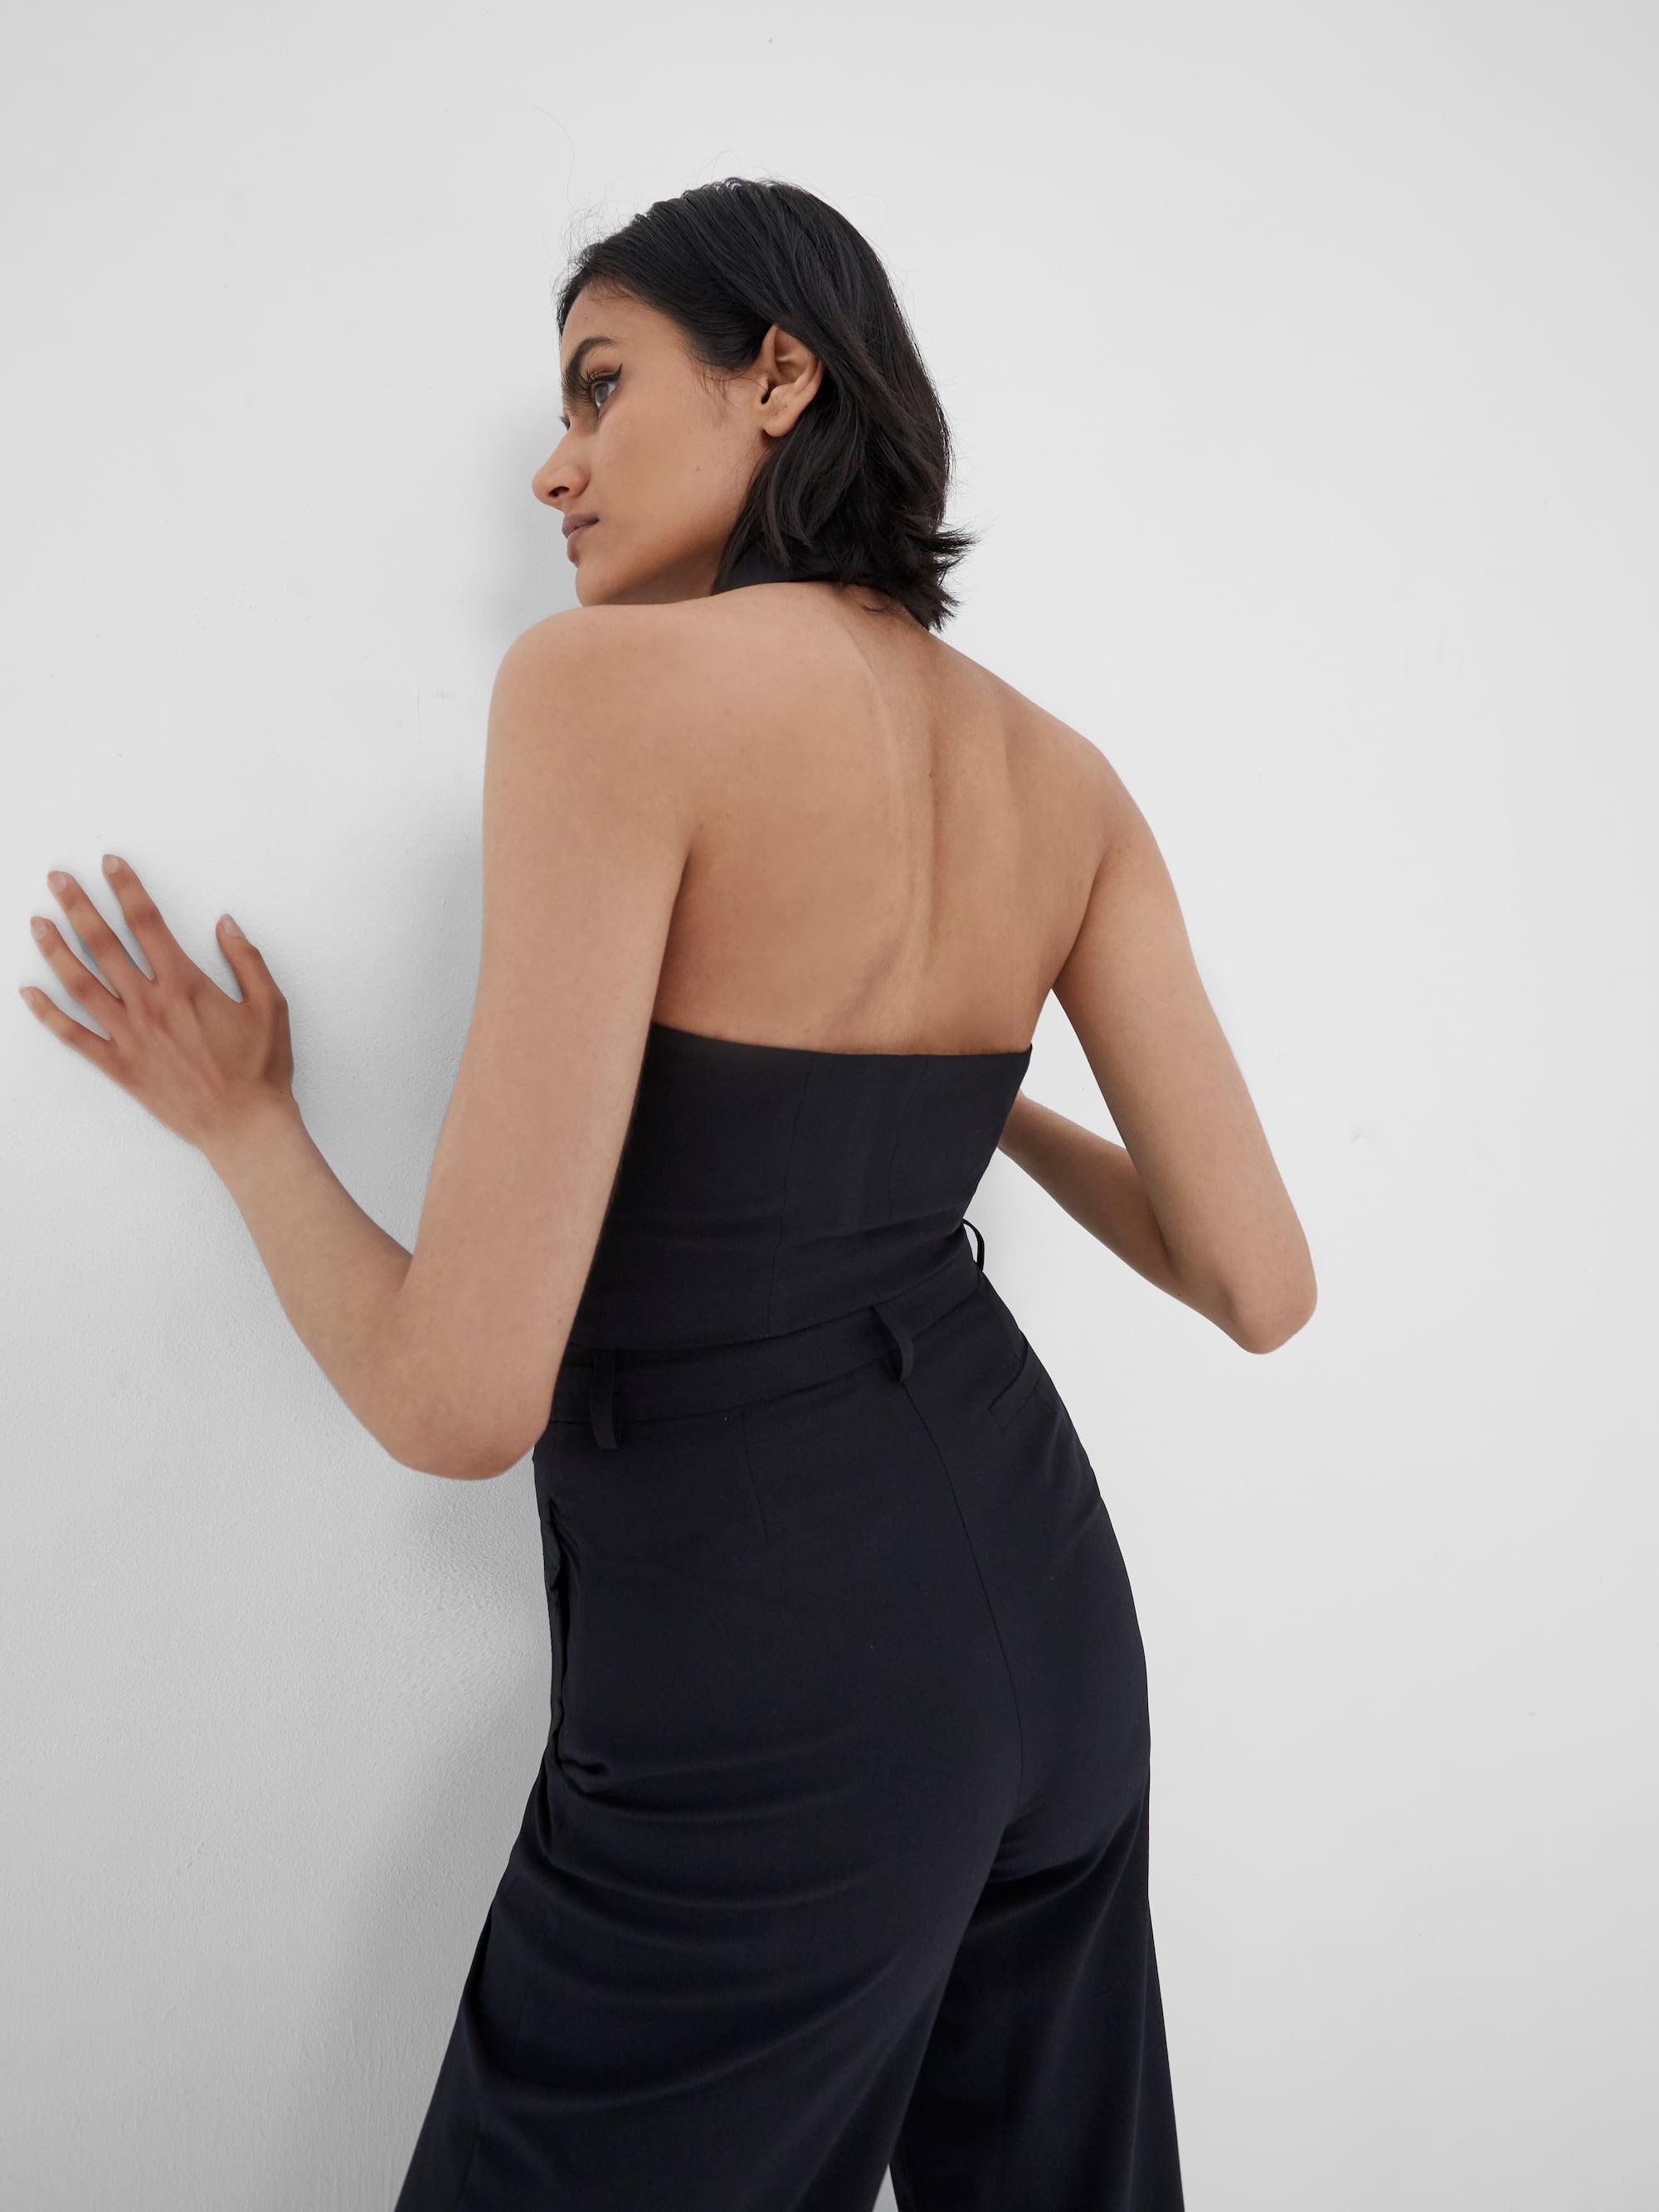 View 2 of model wearing Kamee Suit Vest top in black.